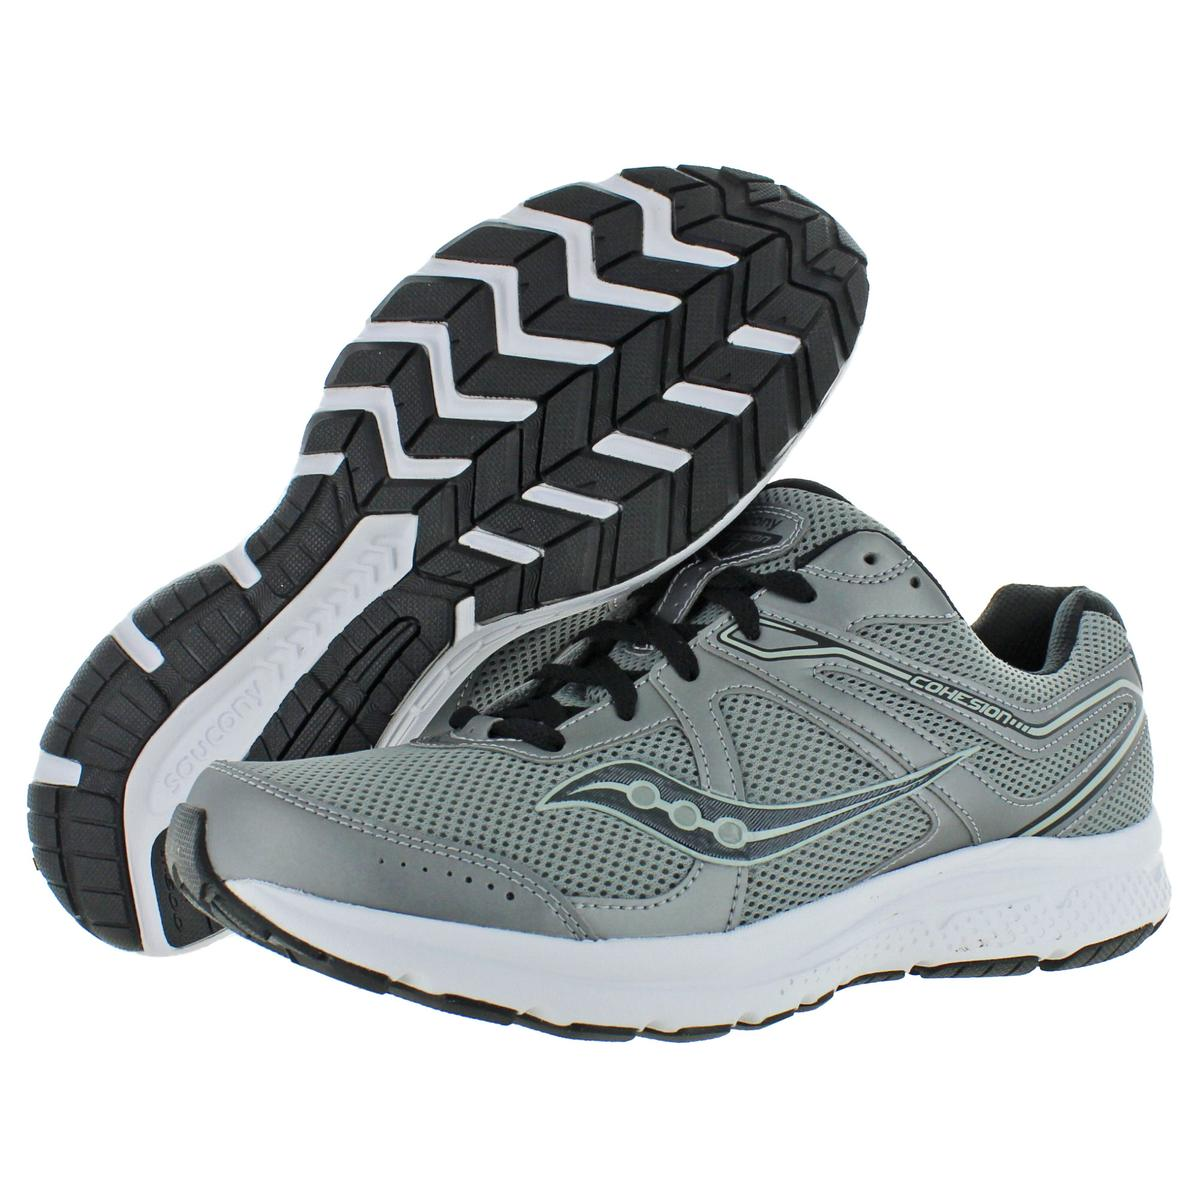 Saucony-Herren-Grid-Kohaesions-11-Ubung-Fitness-Laufschuhe-Sneakers-bhfo-2076 Indexbild 6